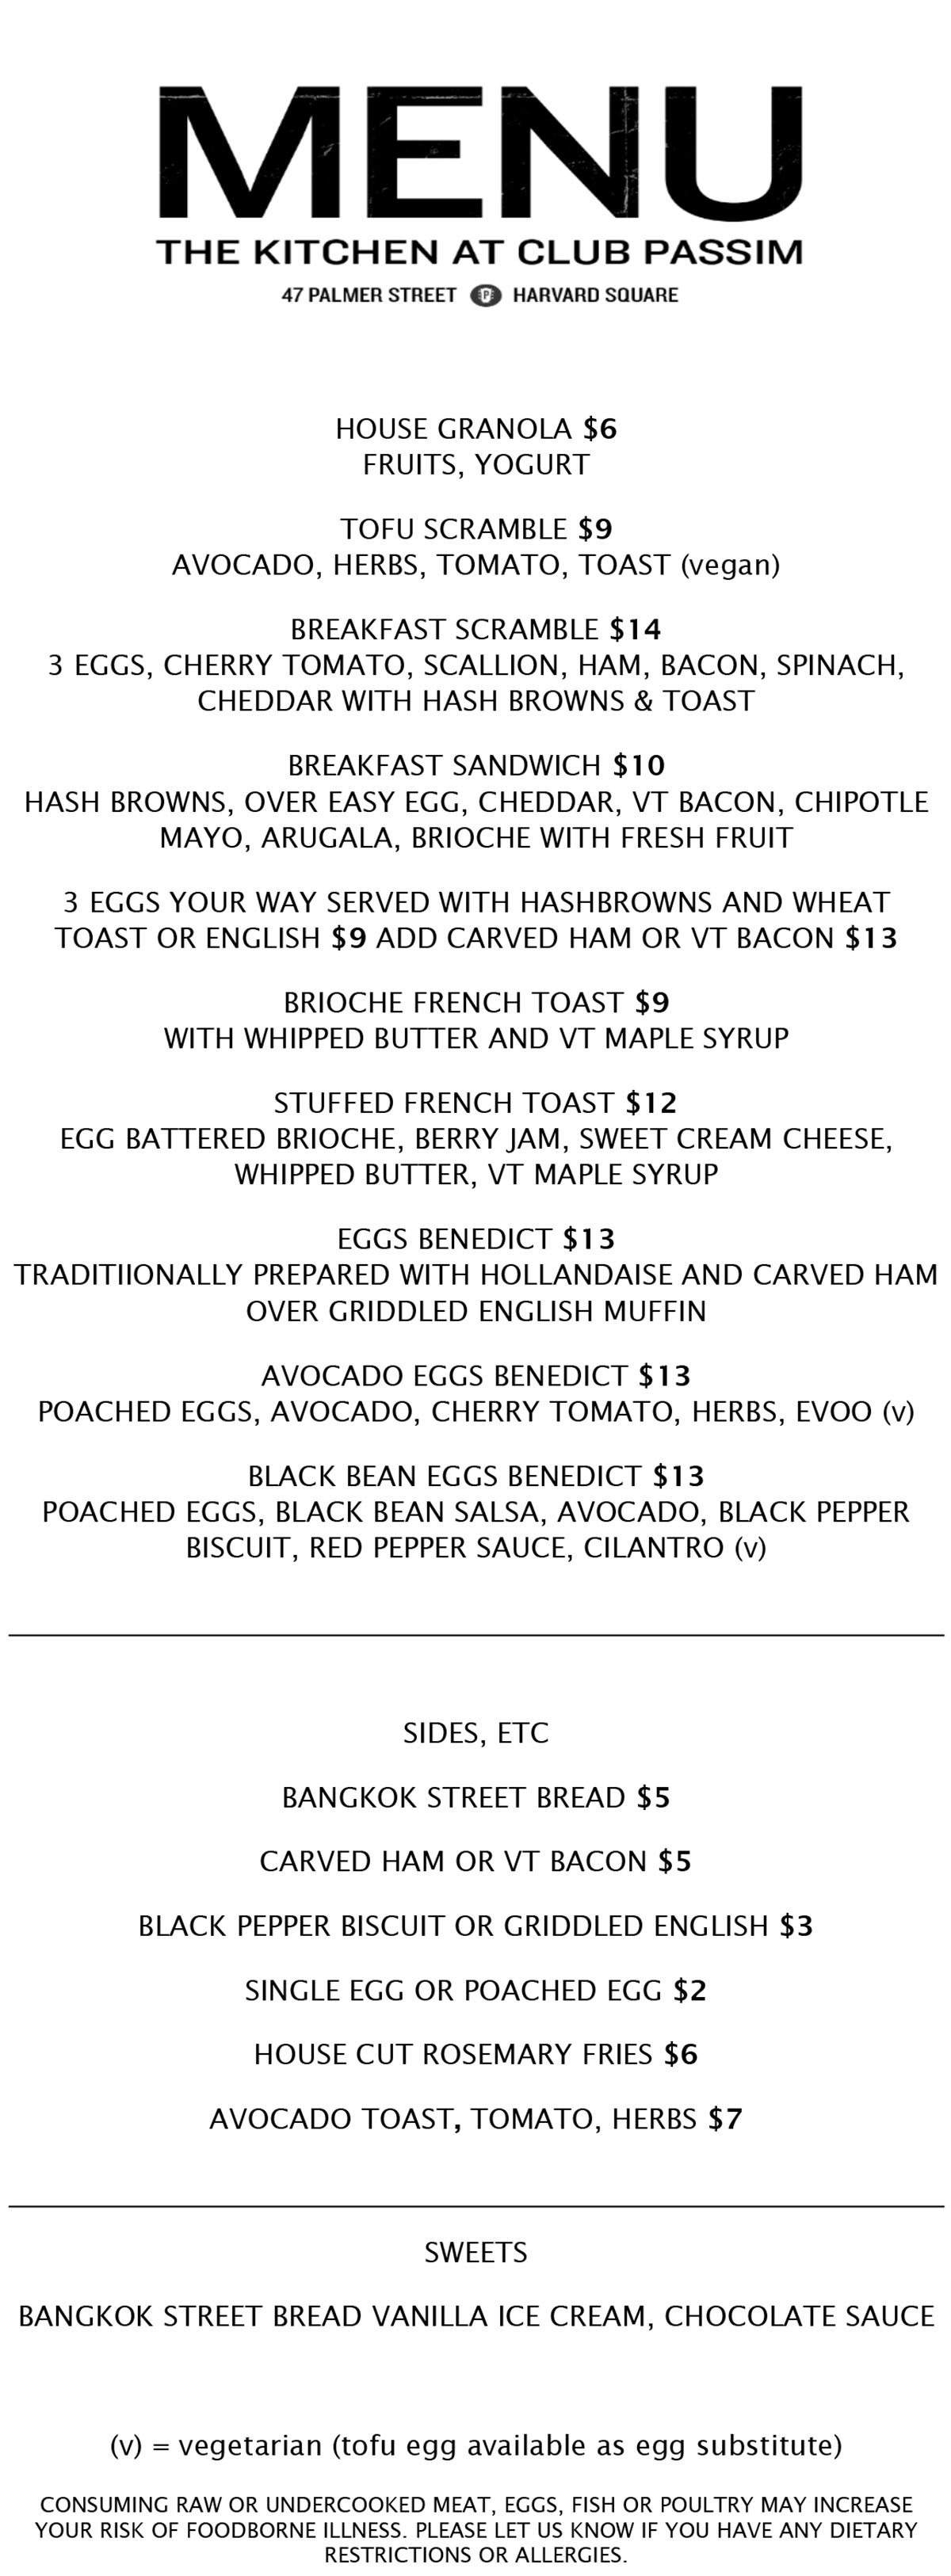 Club Passim brunch menu 2017